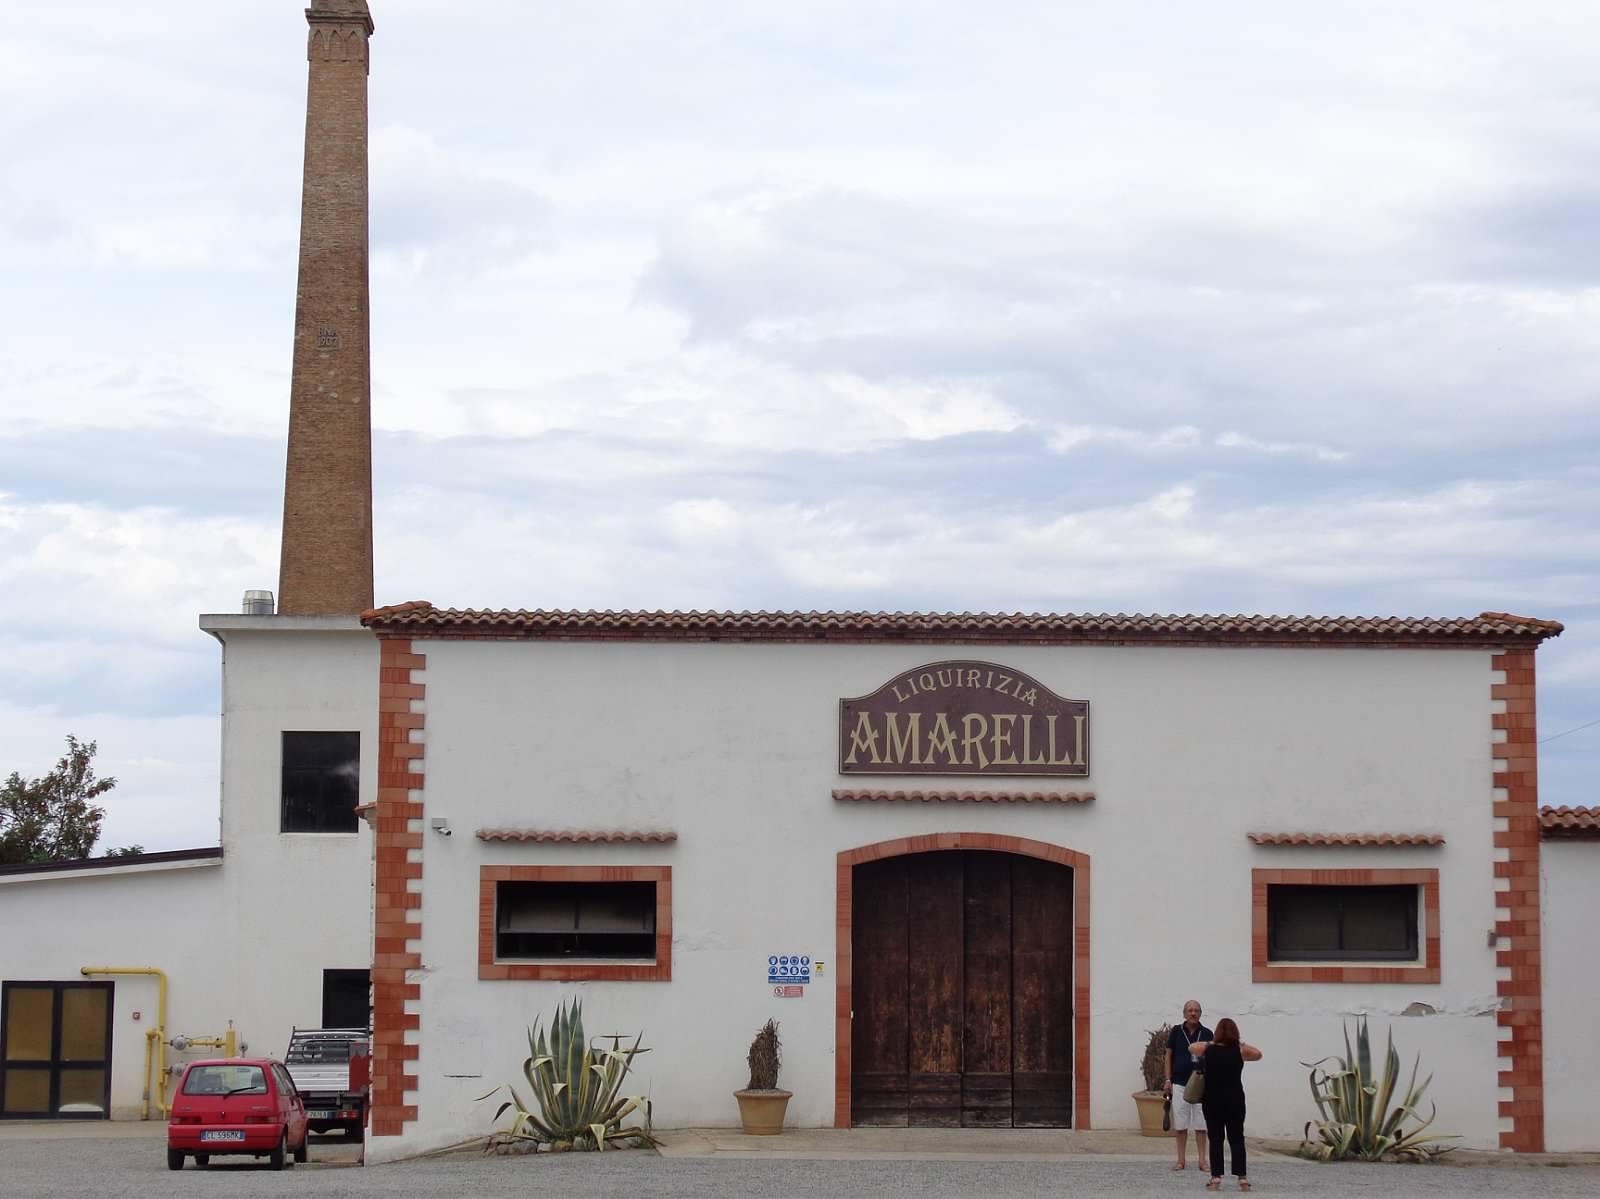 Amarelli.JPG